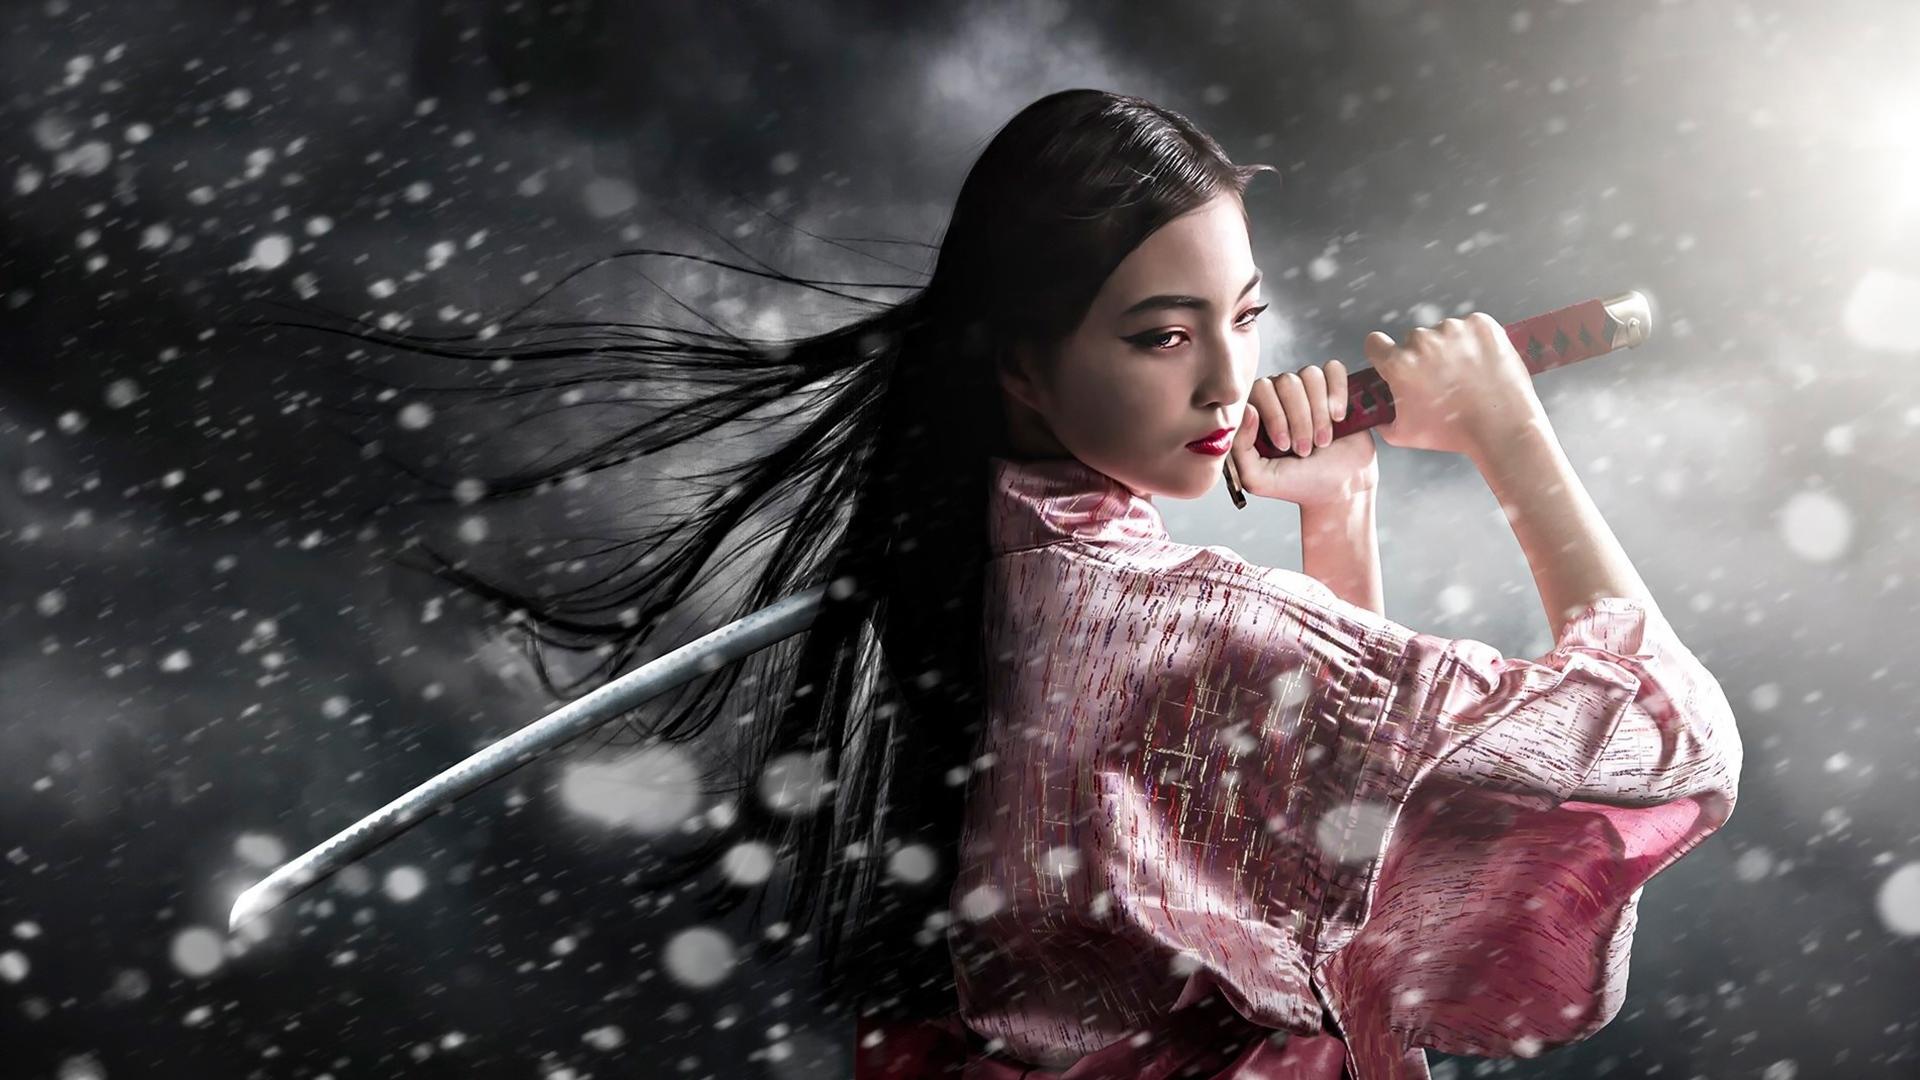 Samurai Backgrounds Free Download